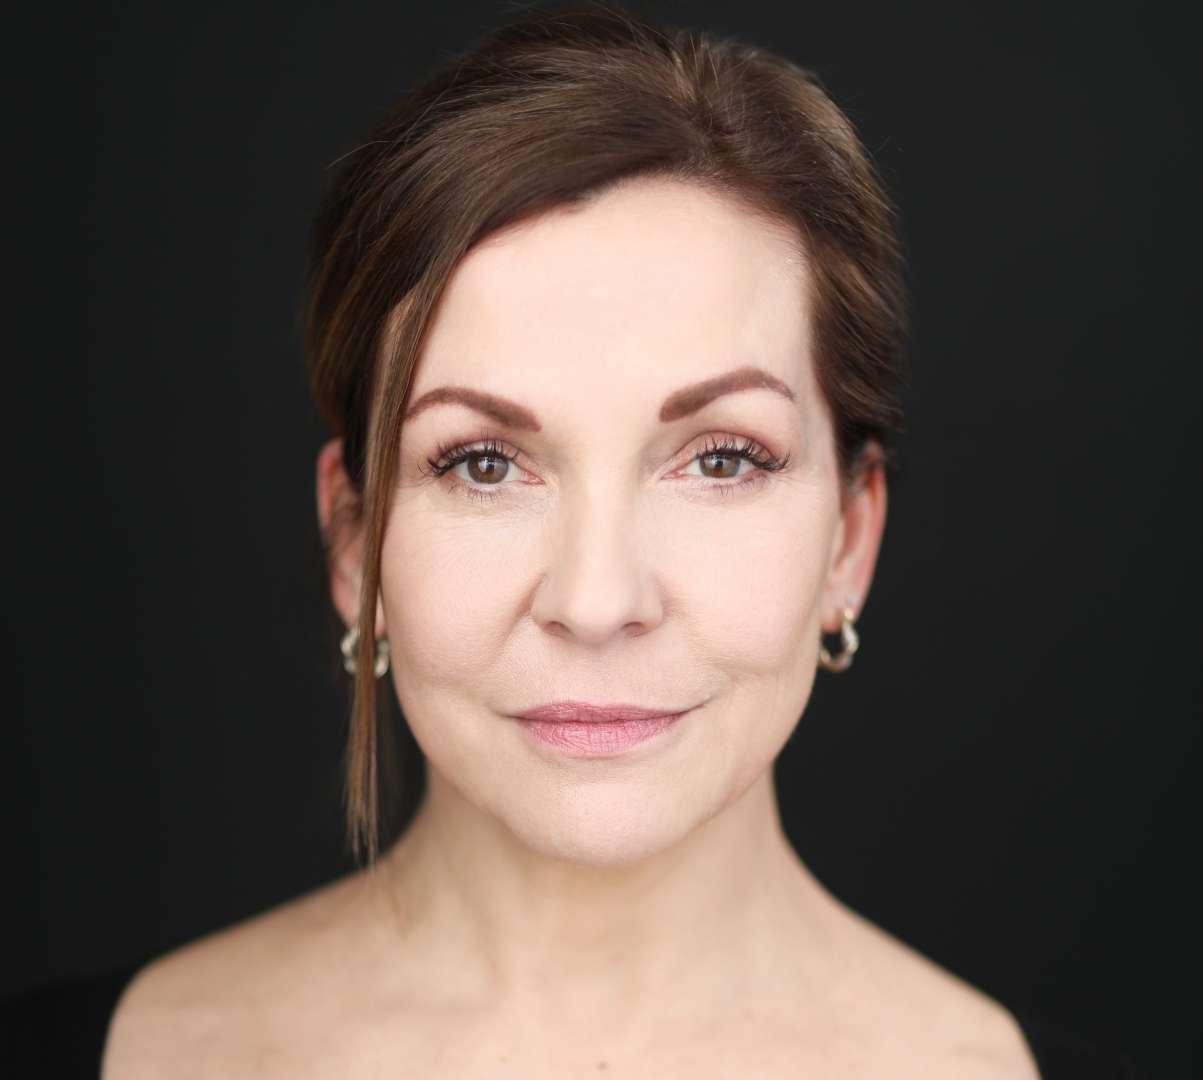 Desiree Zurowski - Limão Mecânico